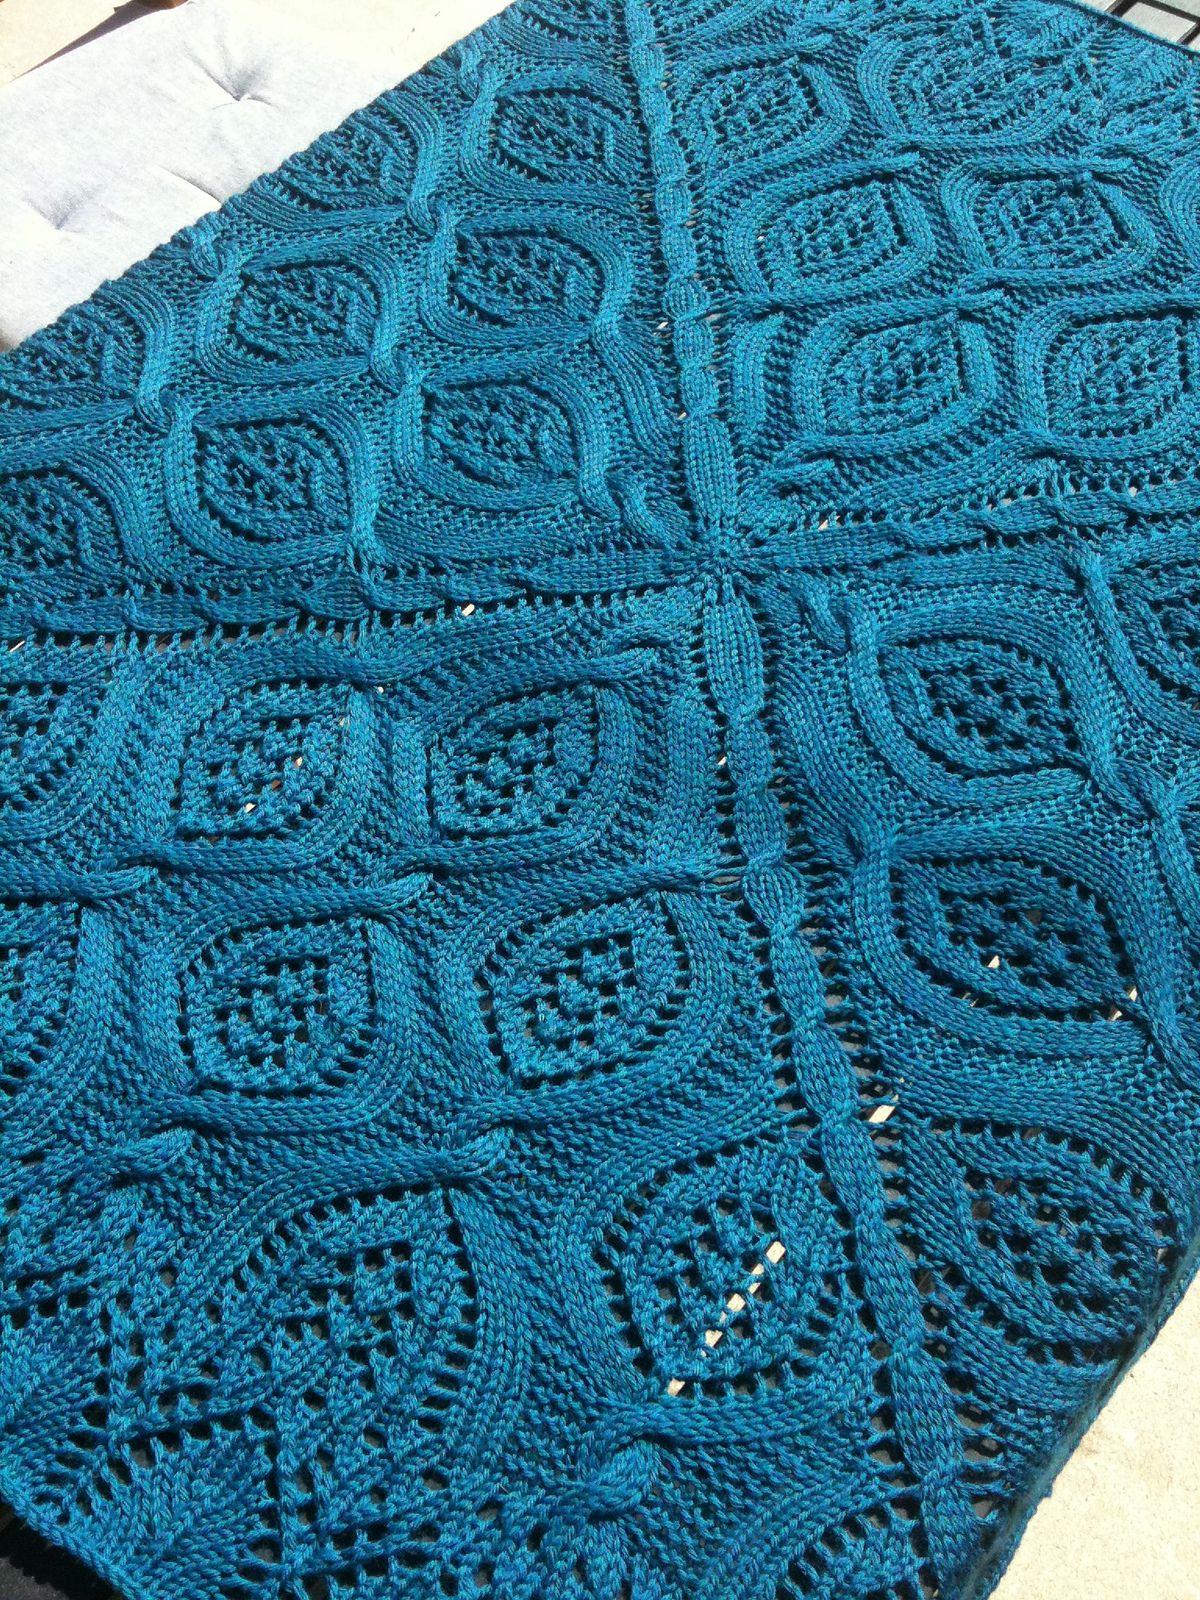 Cable Afghan Knitting Patterns | Pinterest | Serenidad, Manta y Patrones